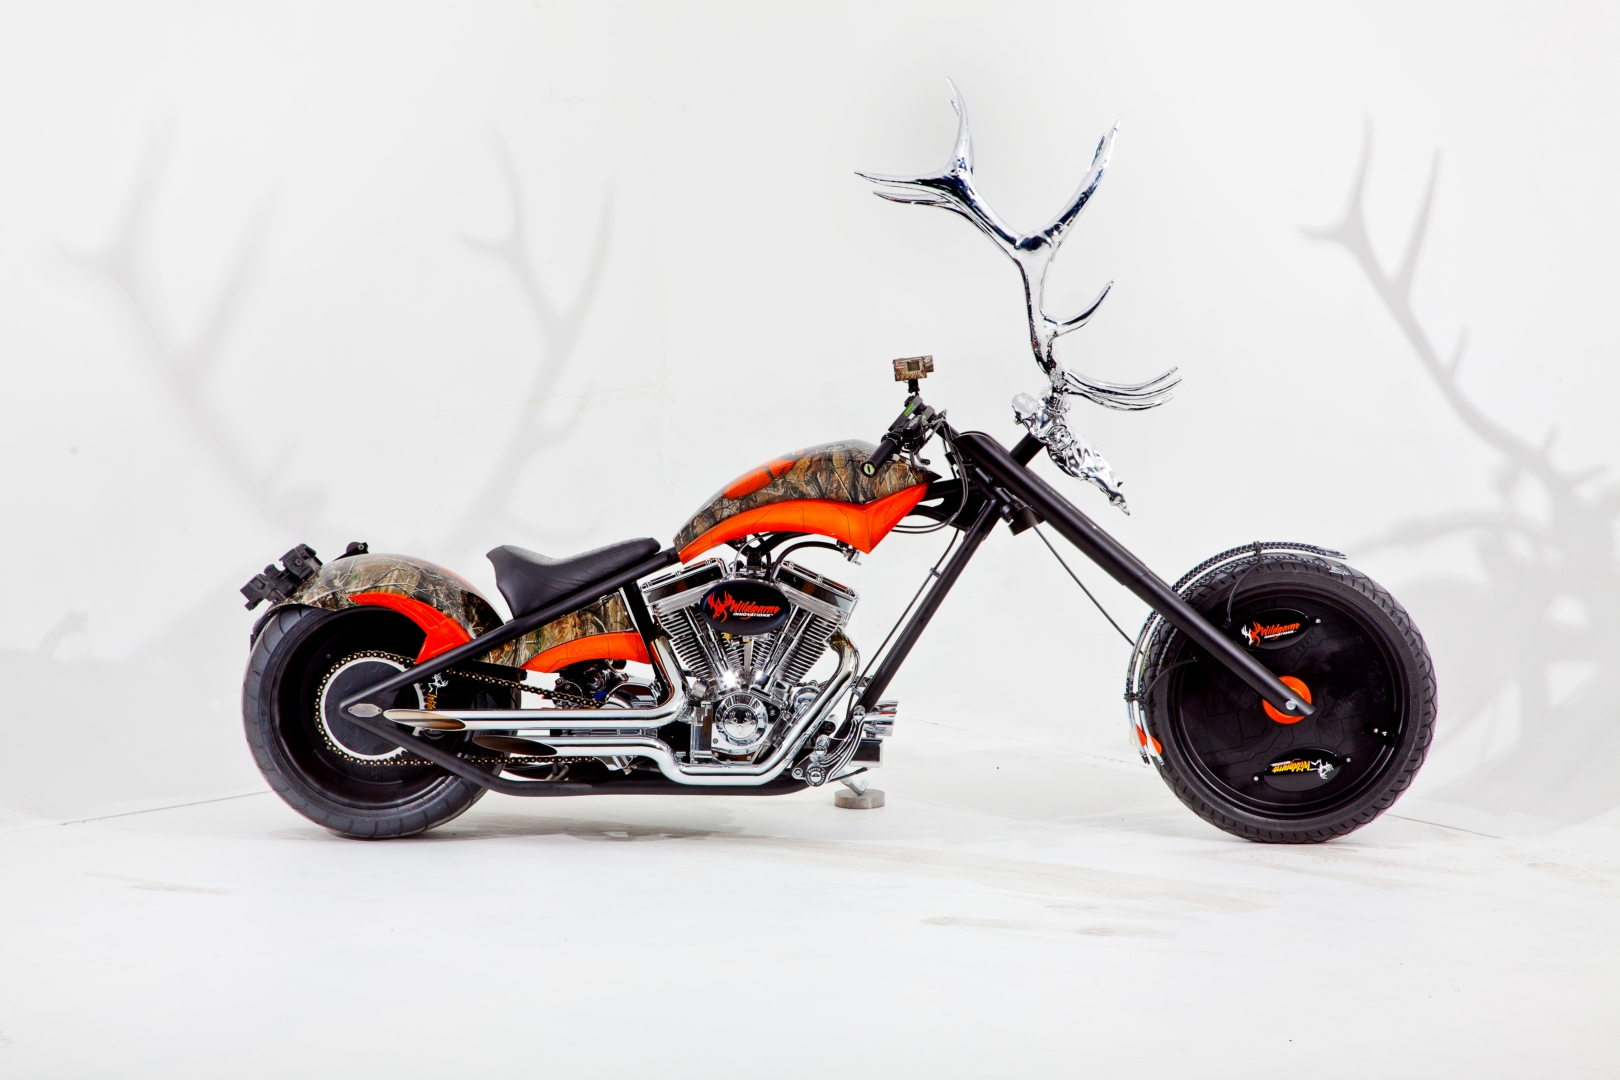 Occ Built The Siemens Custom Green Chopper Autoevolution 750 Kawasaki Motorcycle Wiring Diagram Elk Antler